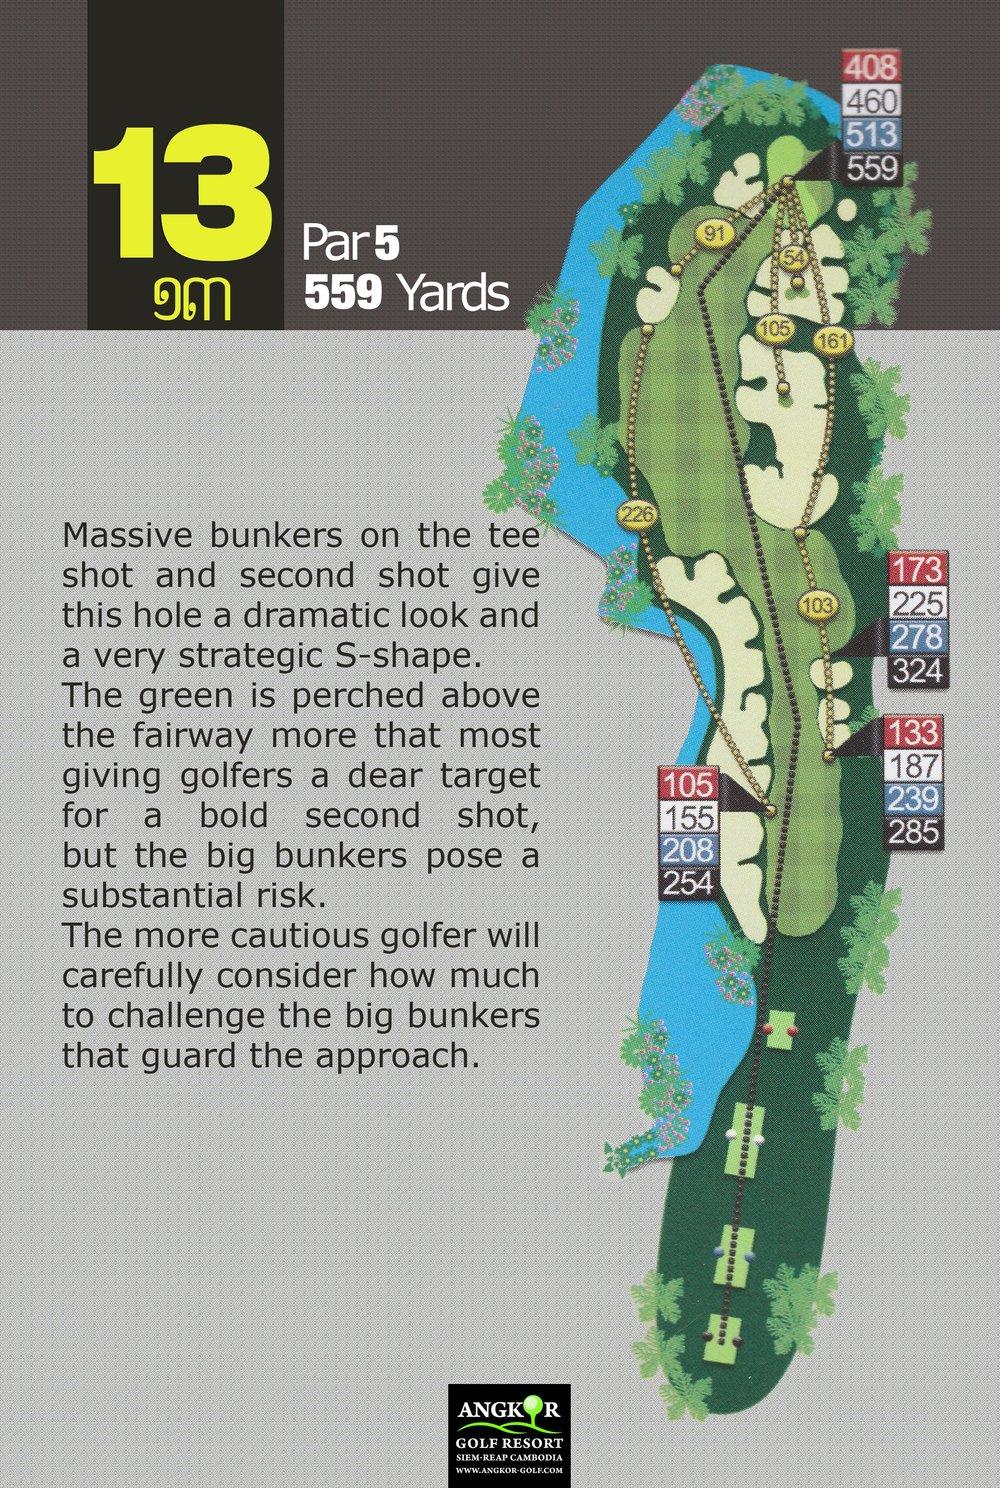 Hole 13 - Par 5 559 Yards